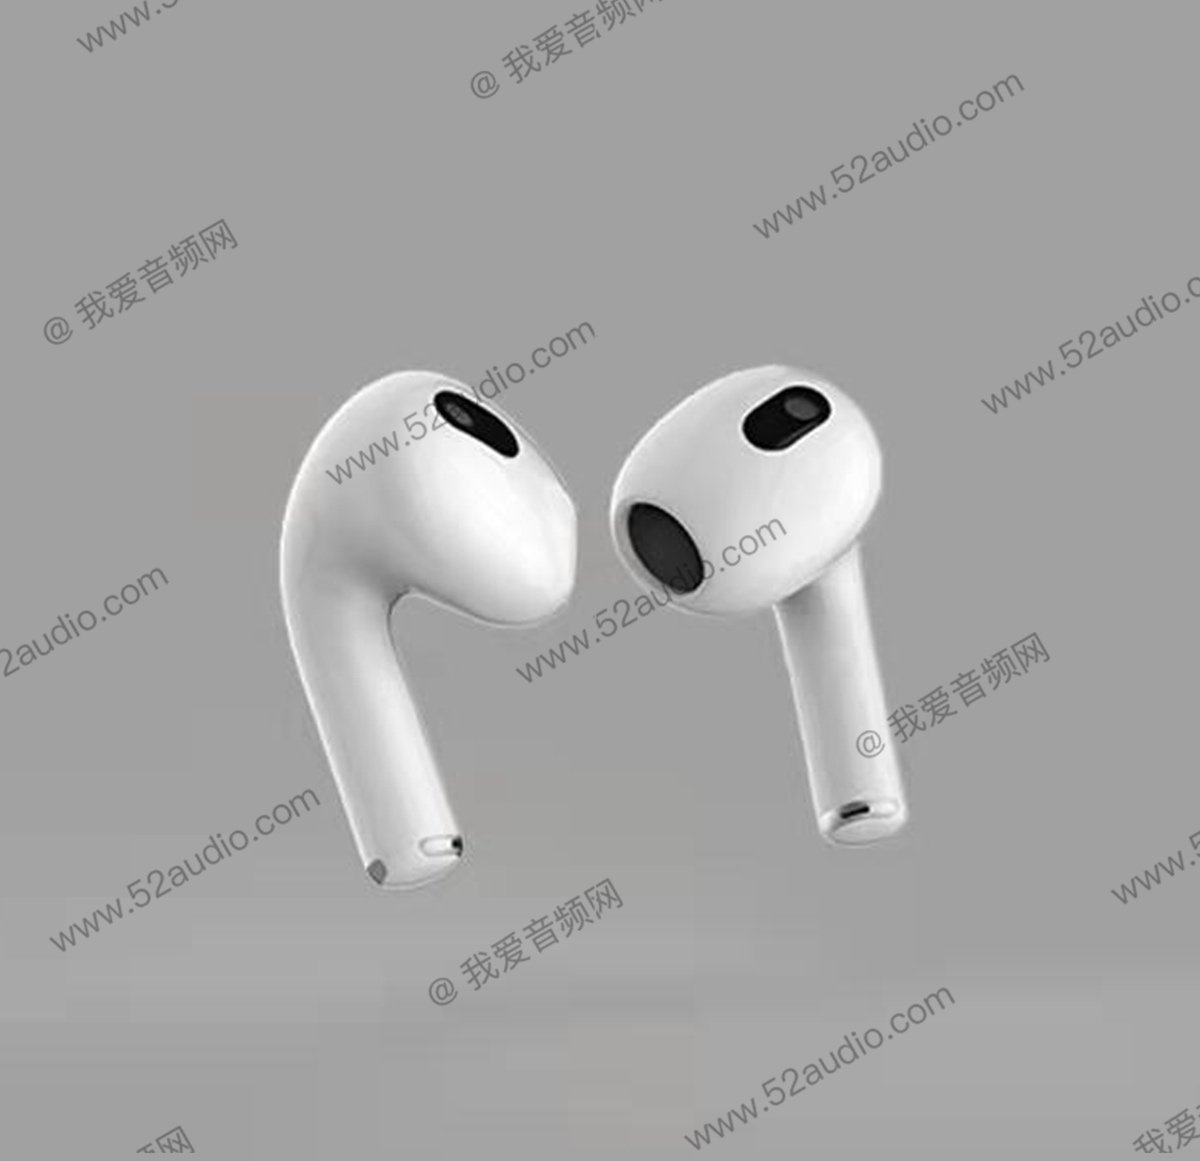 Apple April 20 Event